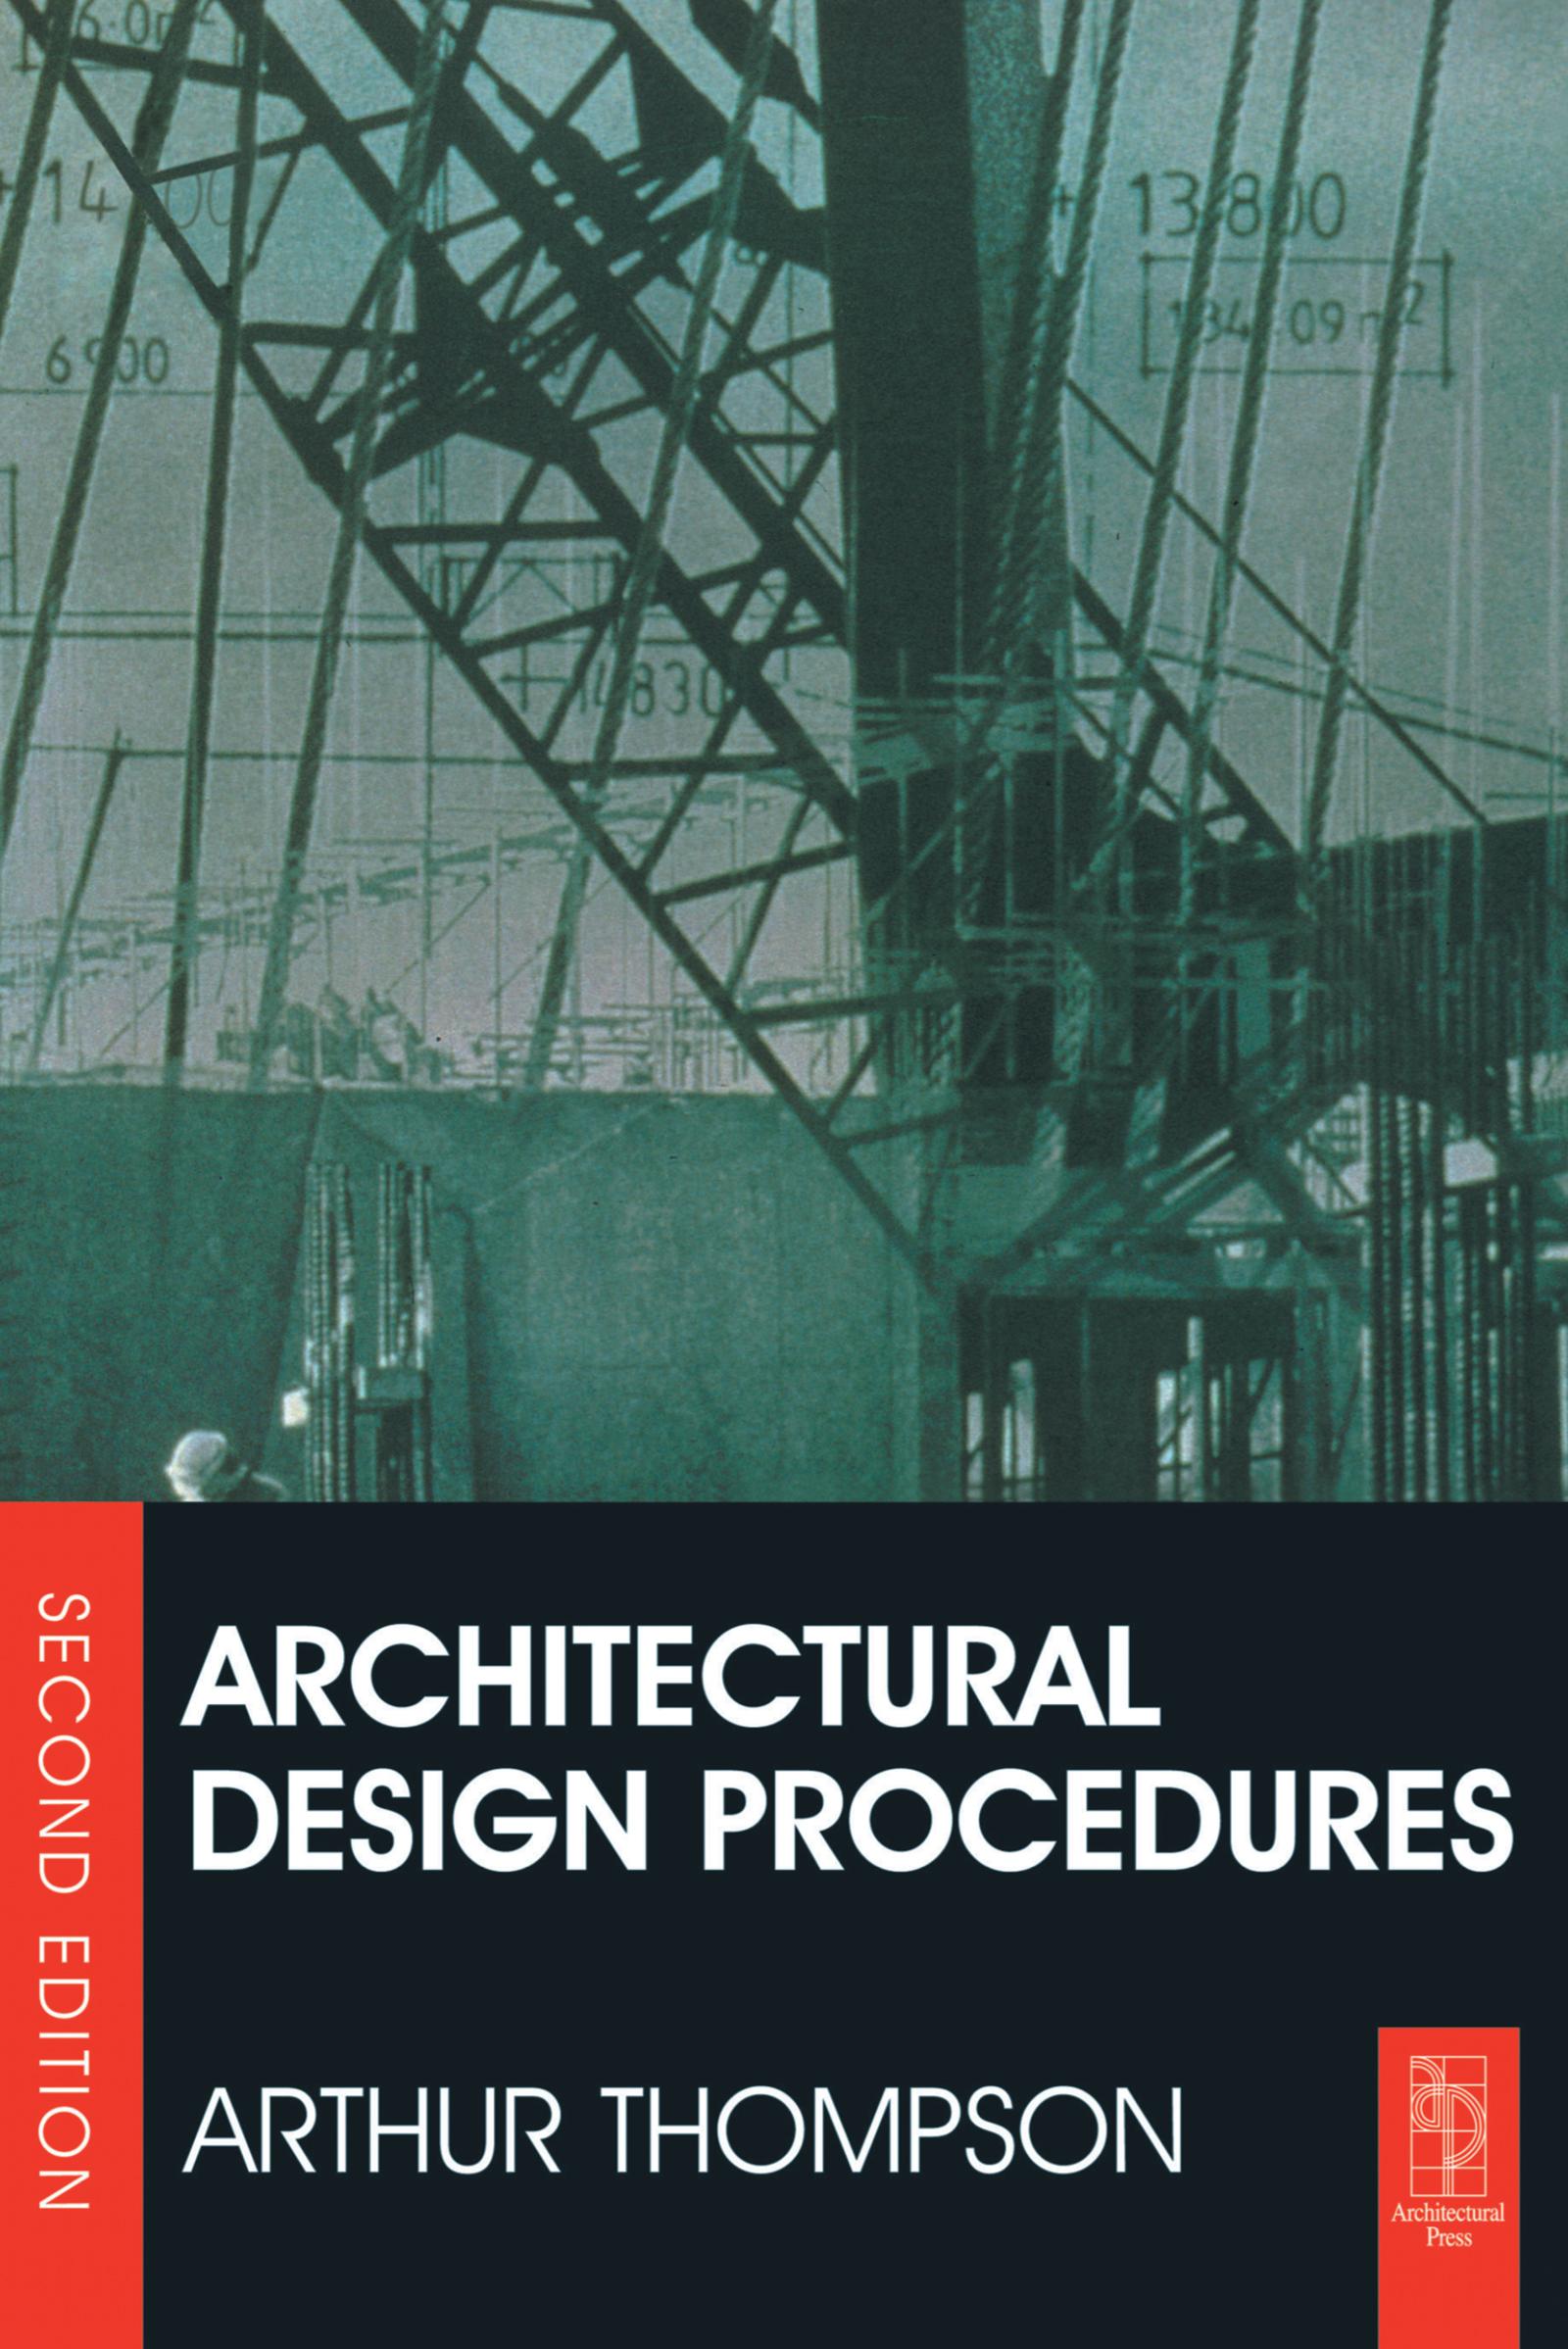 Architectural Design Procedures